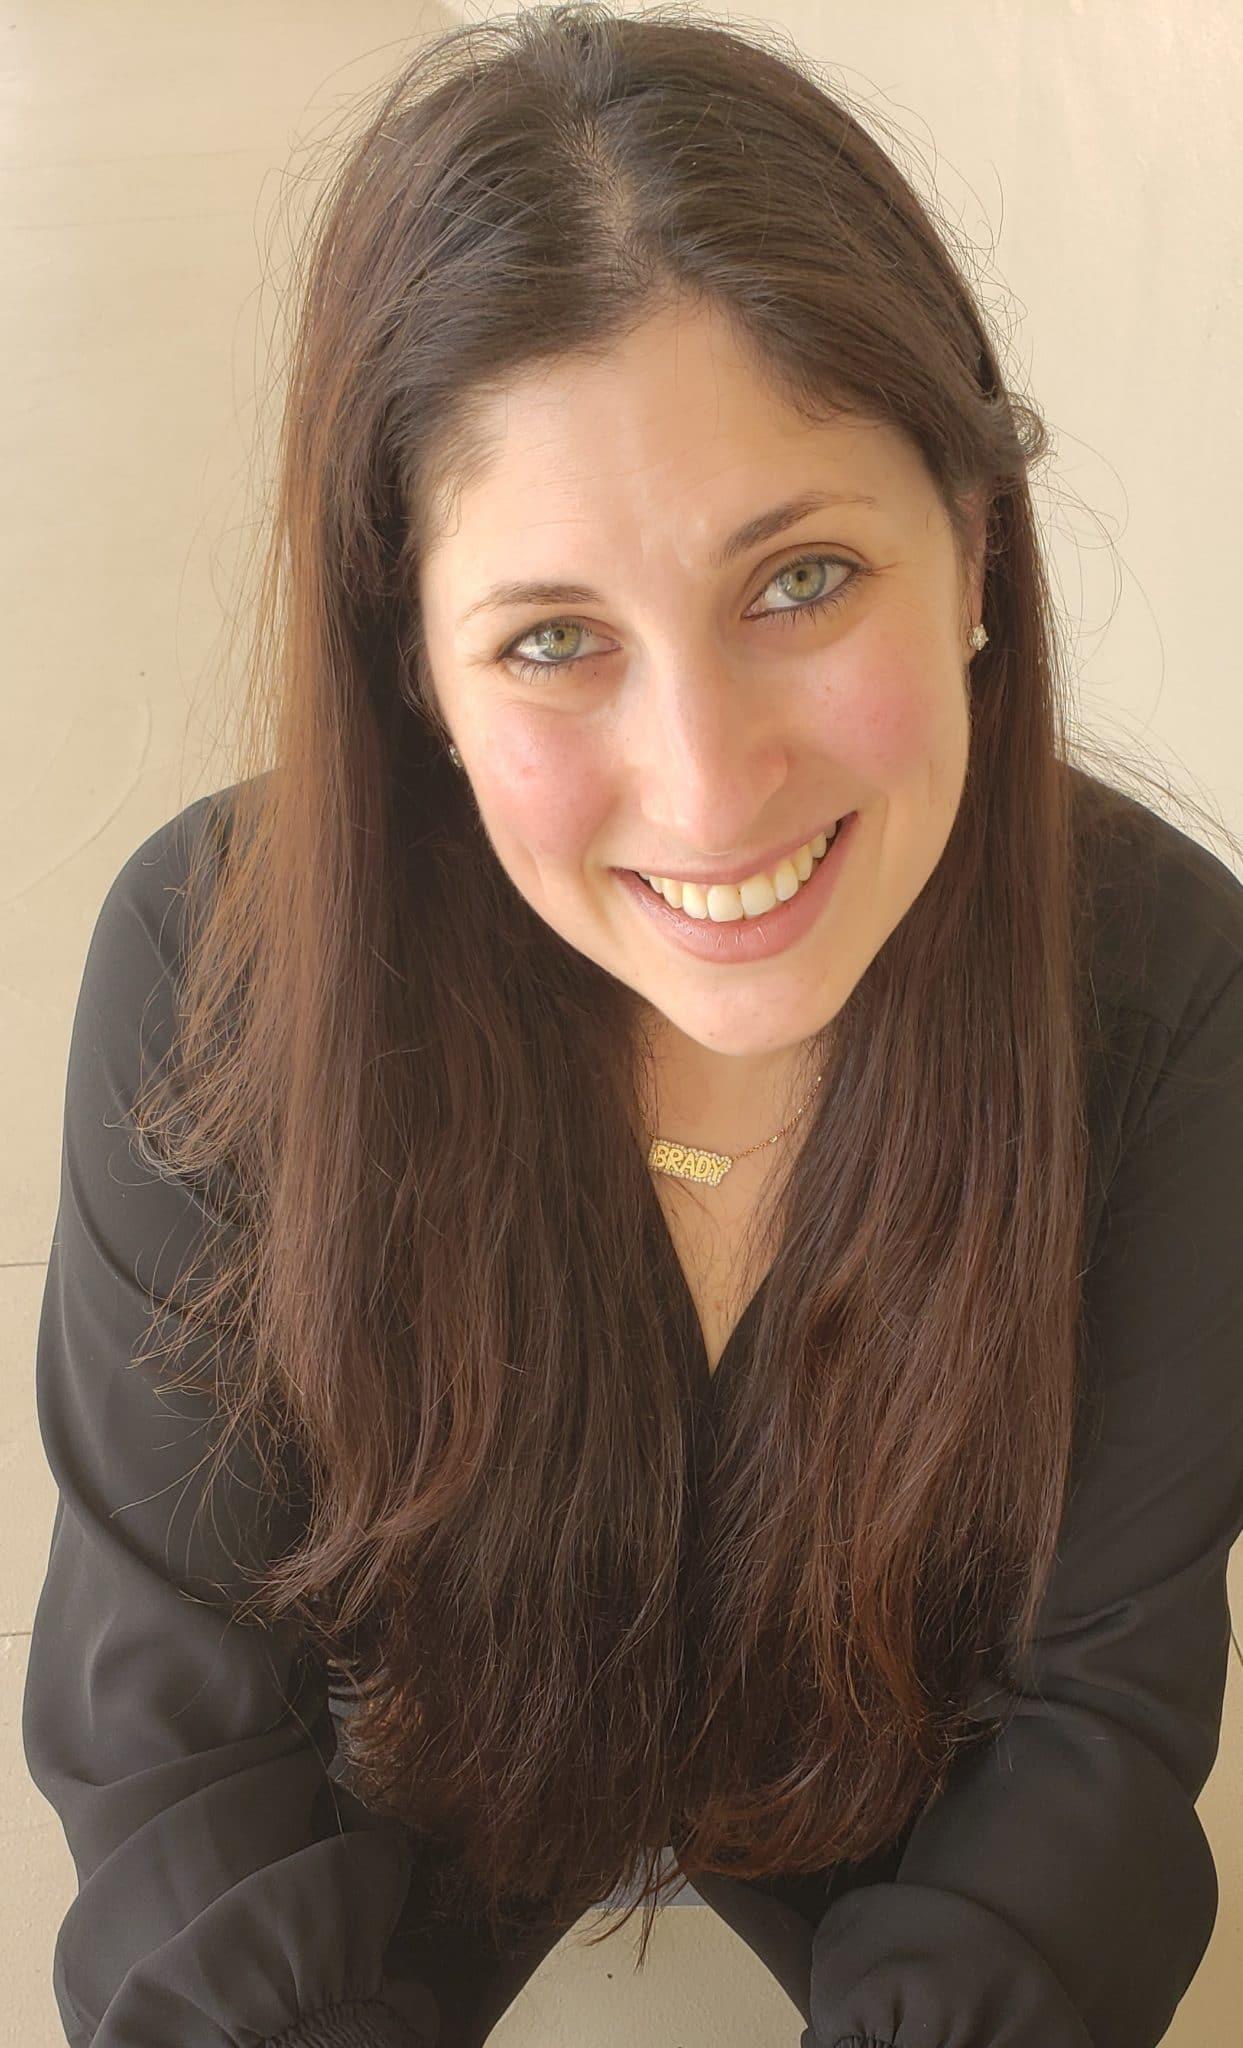 Jessica Silevitch